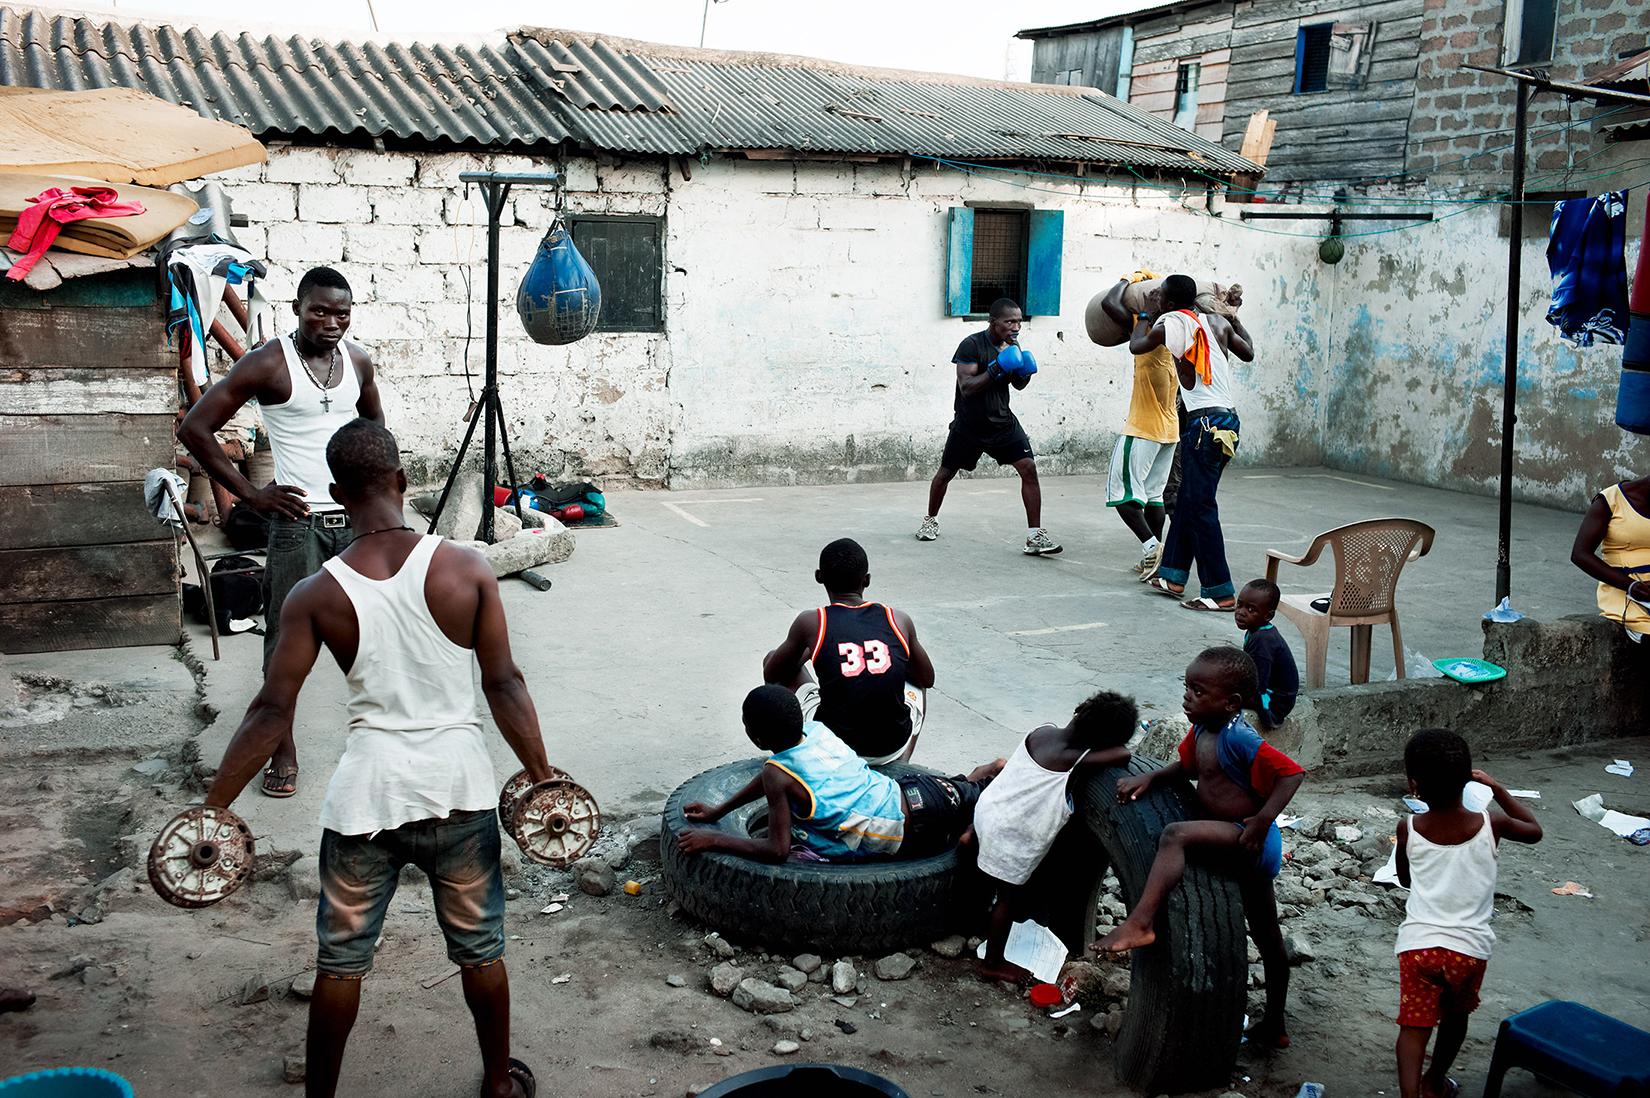 photography_boxersinghana_andreasjakwerth_09